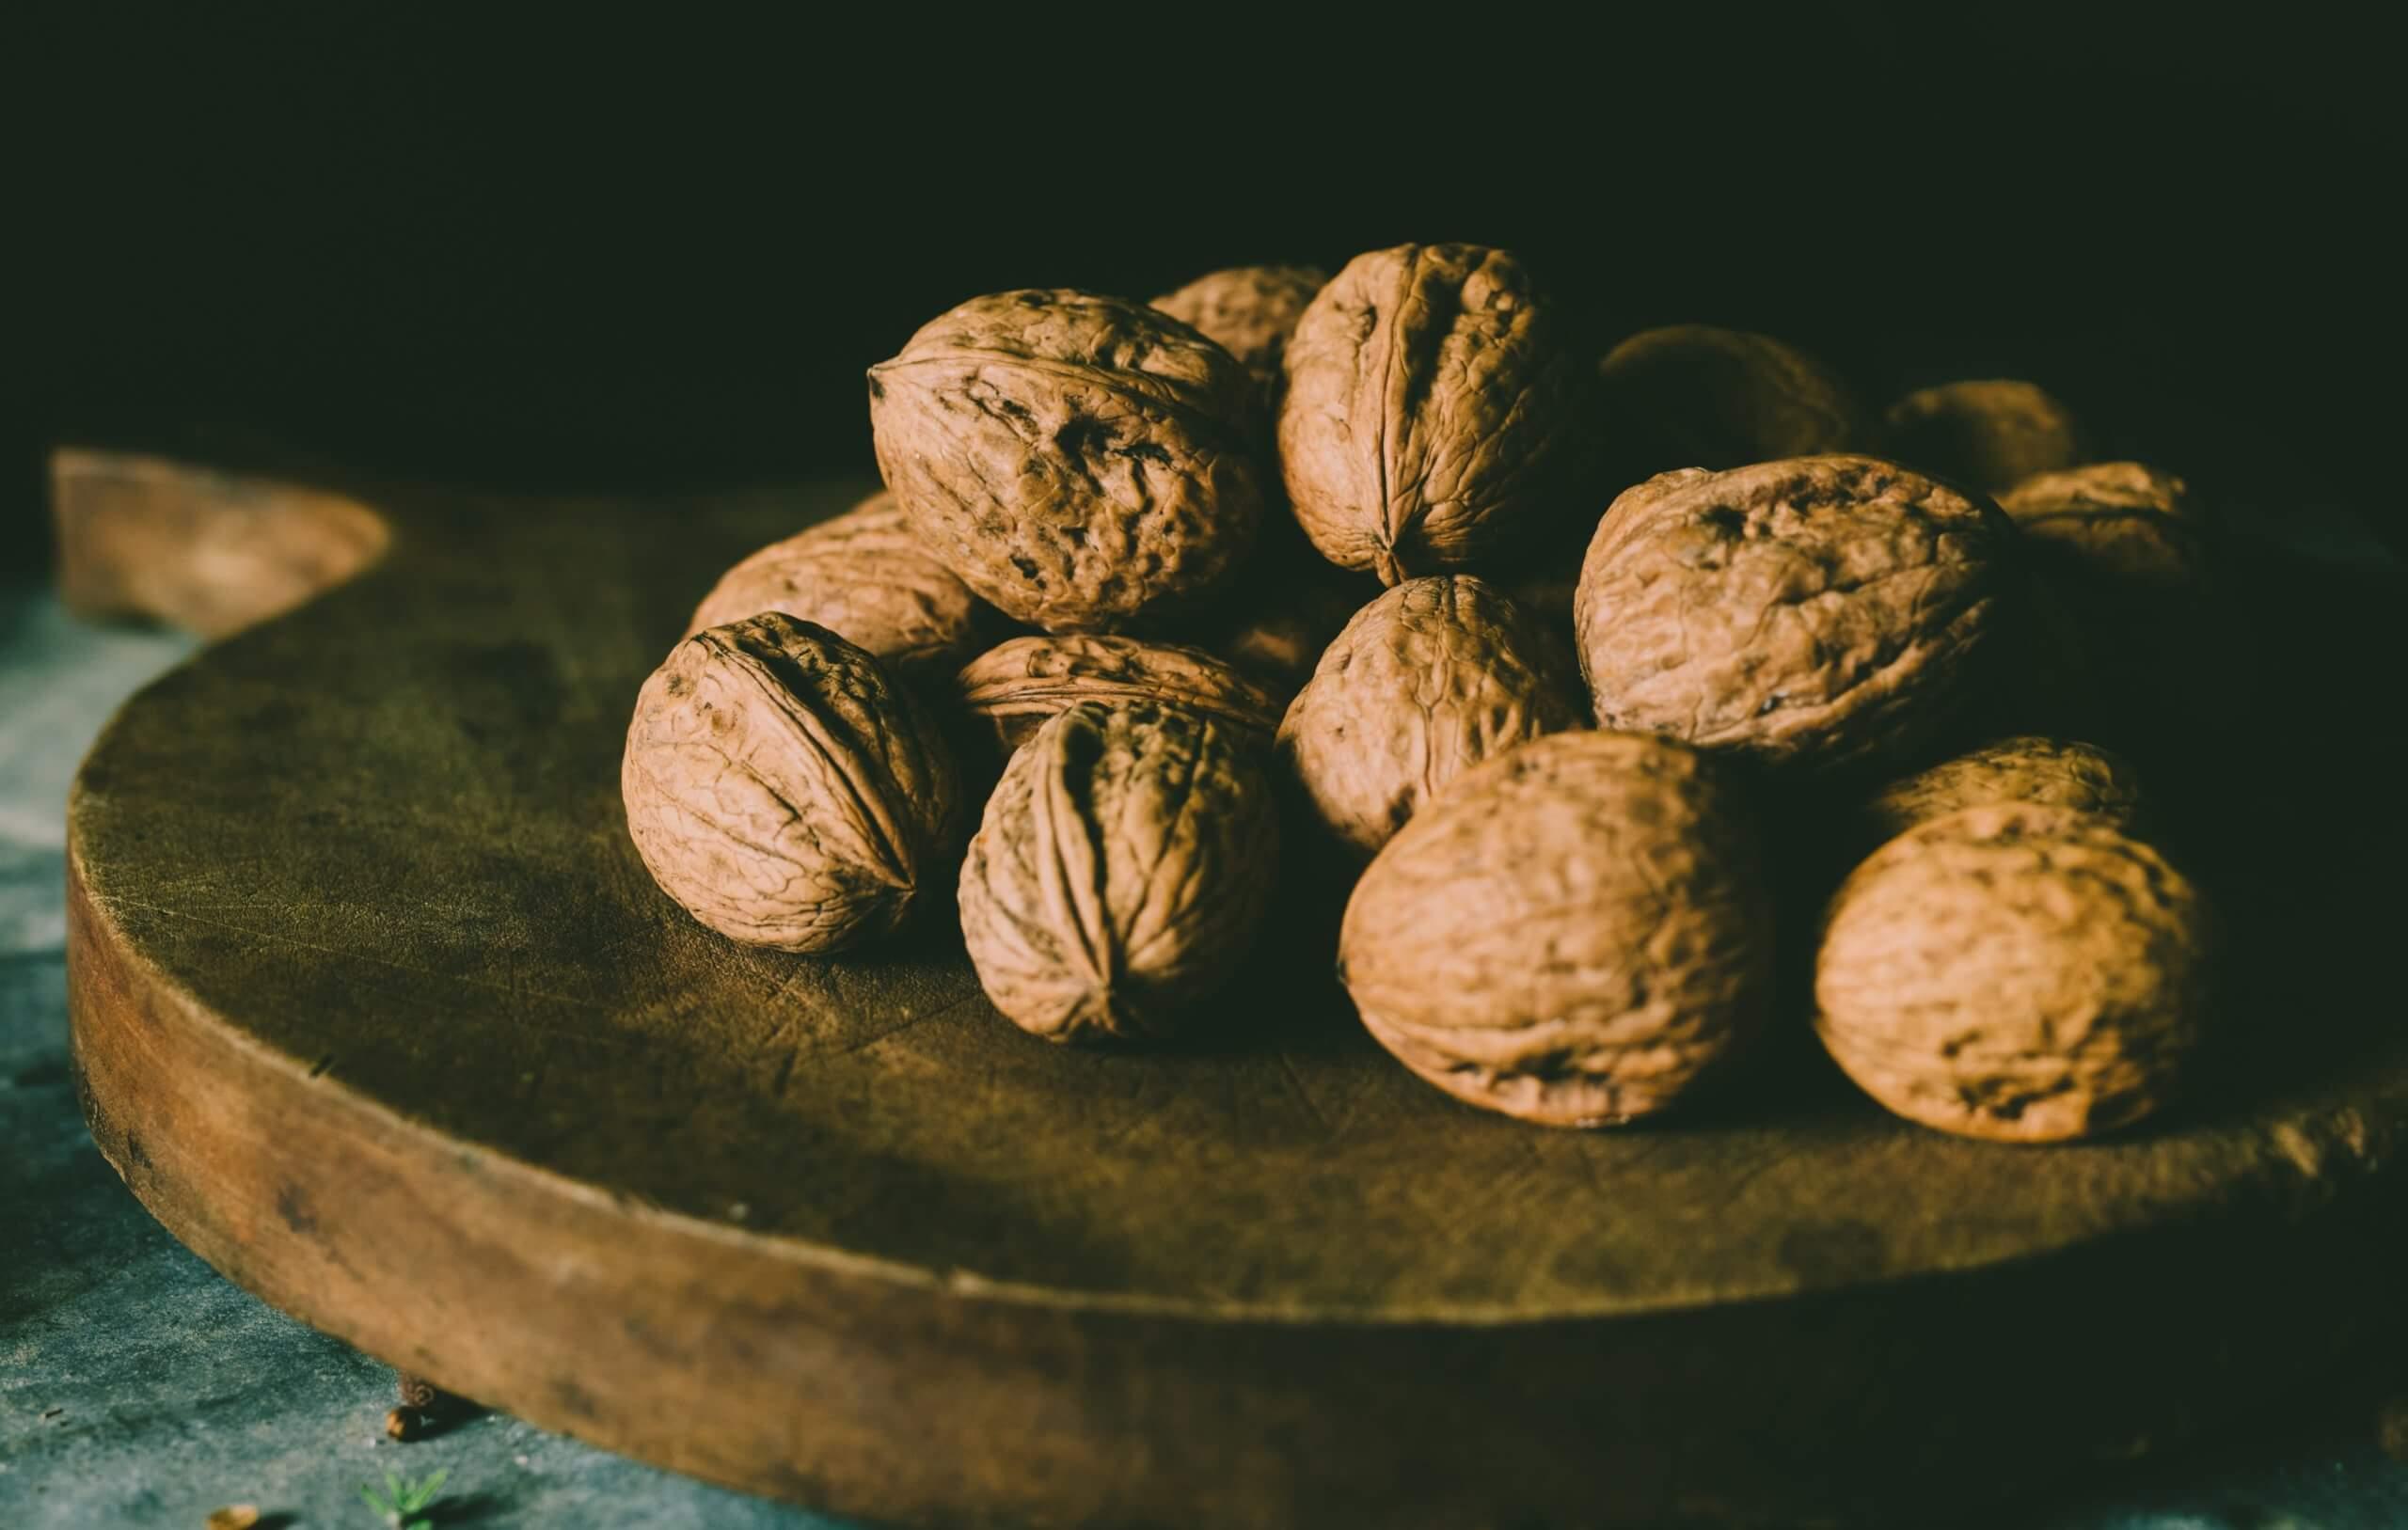 Walnut-Nutto-Frutto-14-scaled.jpg